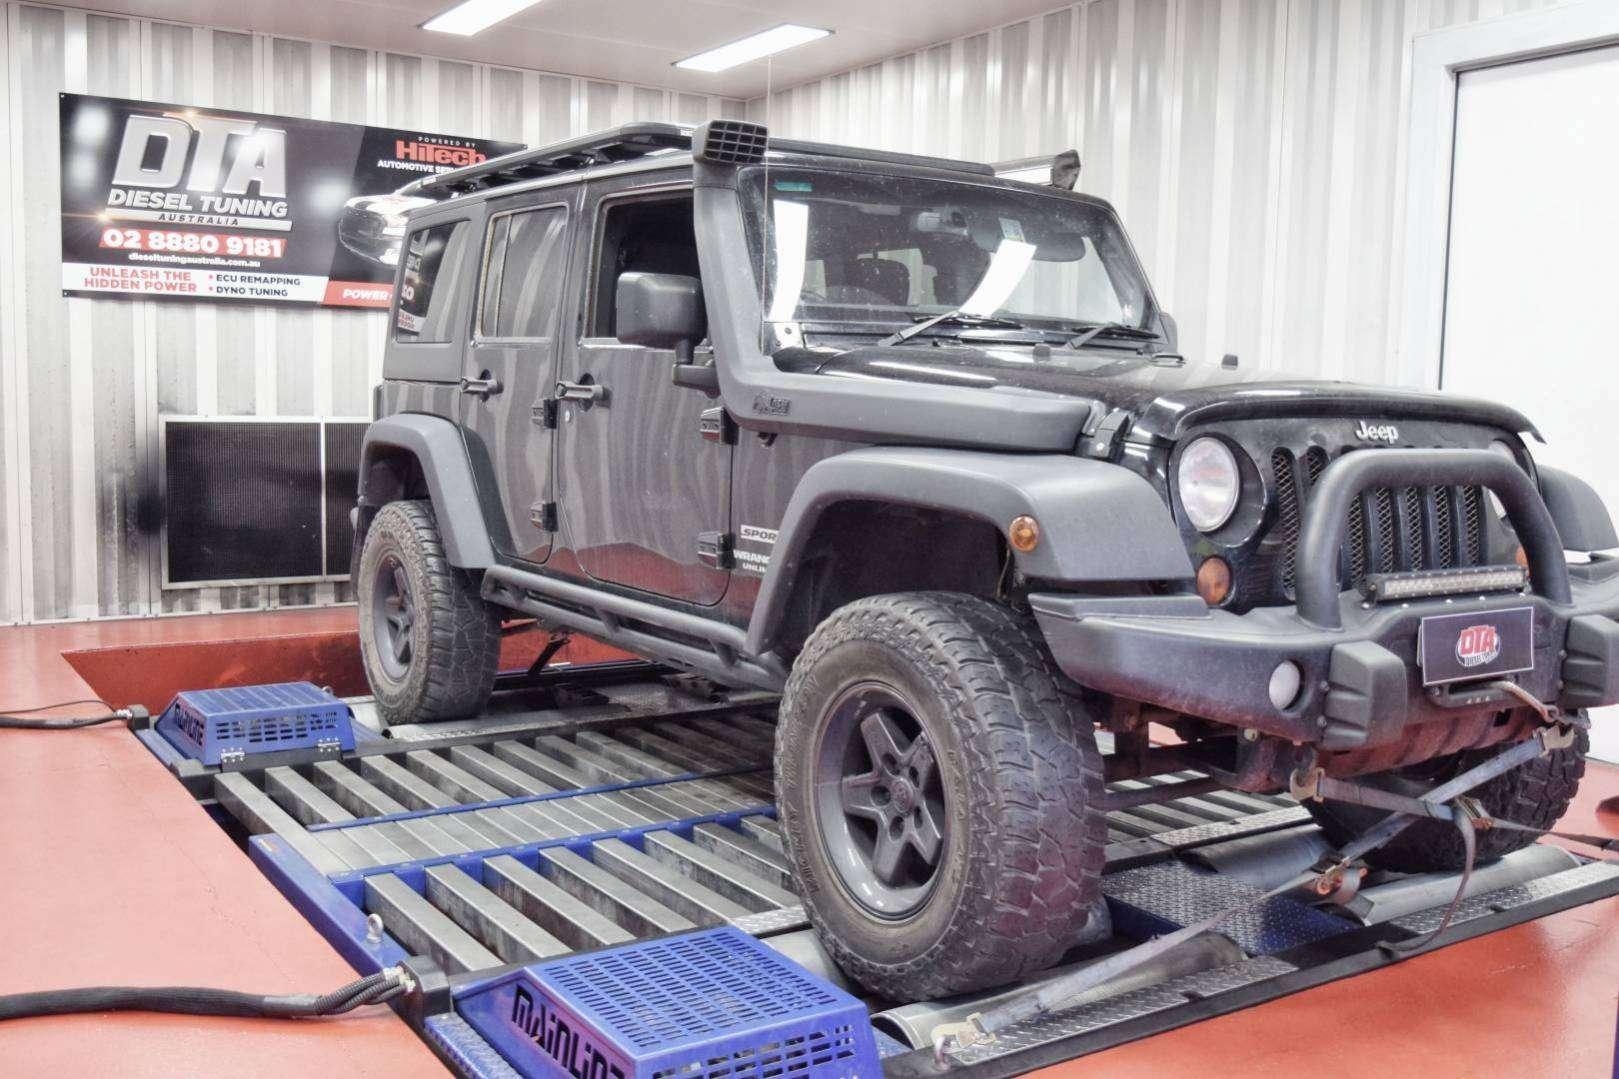 Jeep Wrangler 2 8L 147 kW ECU REMAP - Diesel tuning specialist